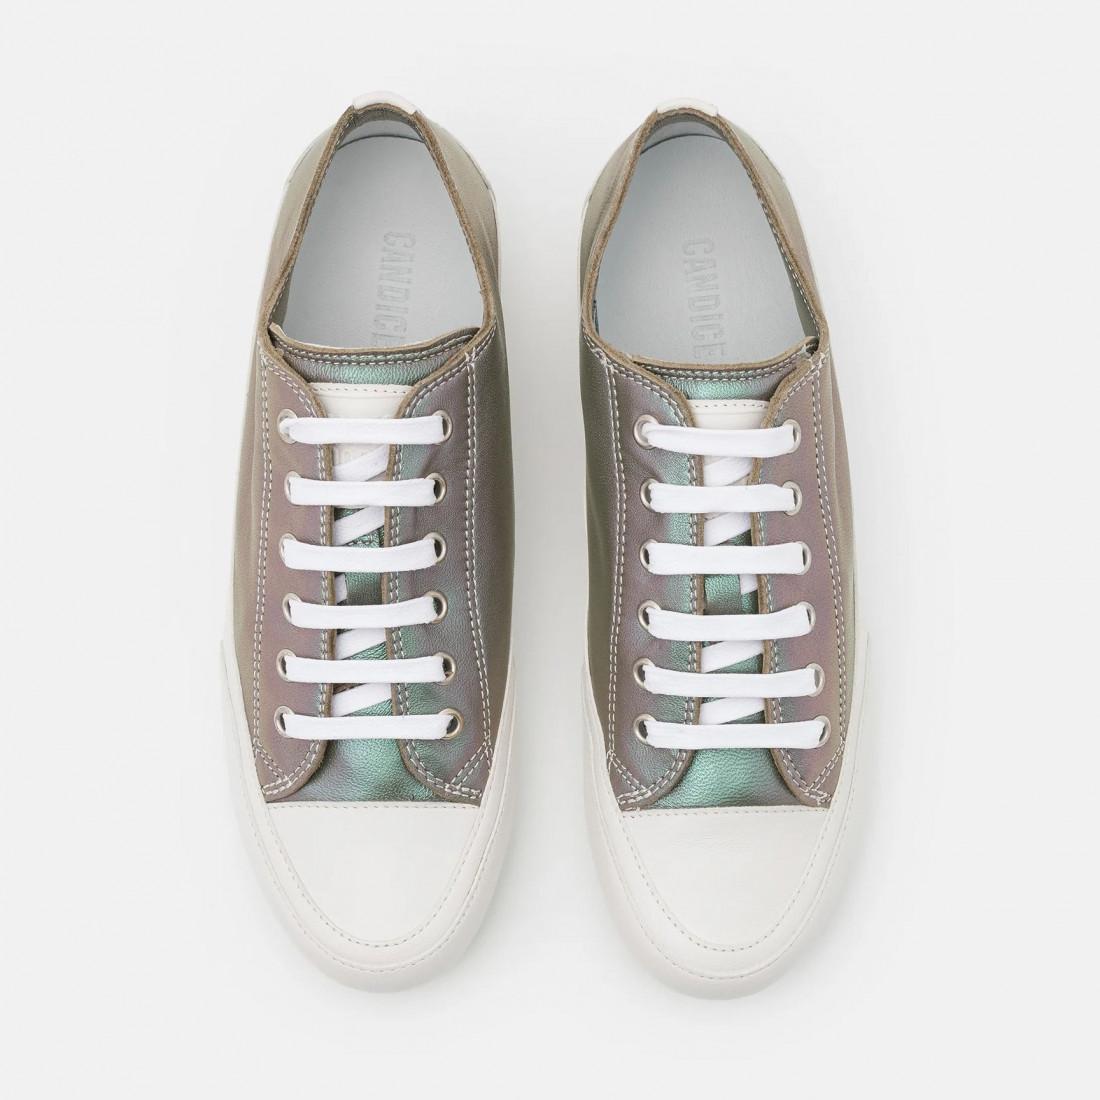 sneakers donna candice cooper d7131rock crust ginevra 8546